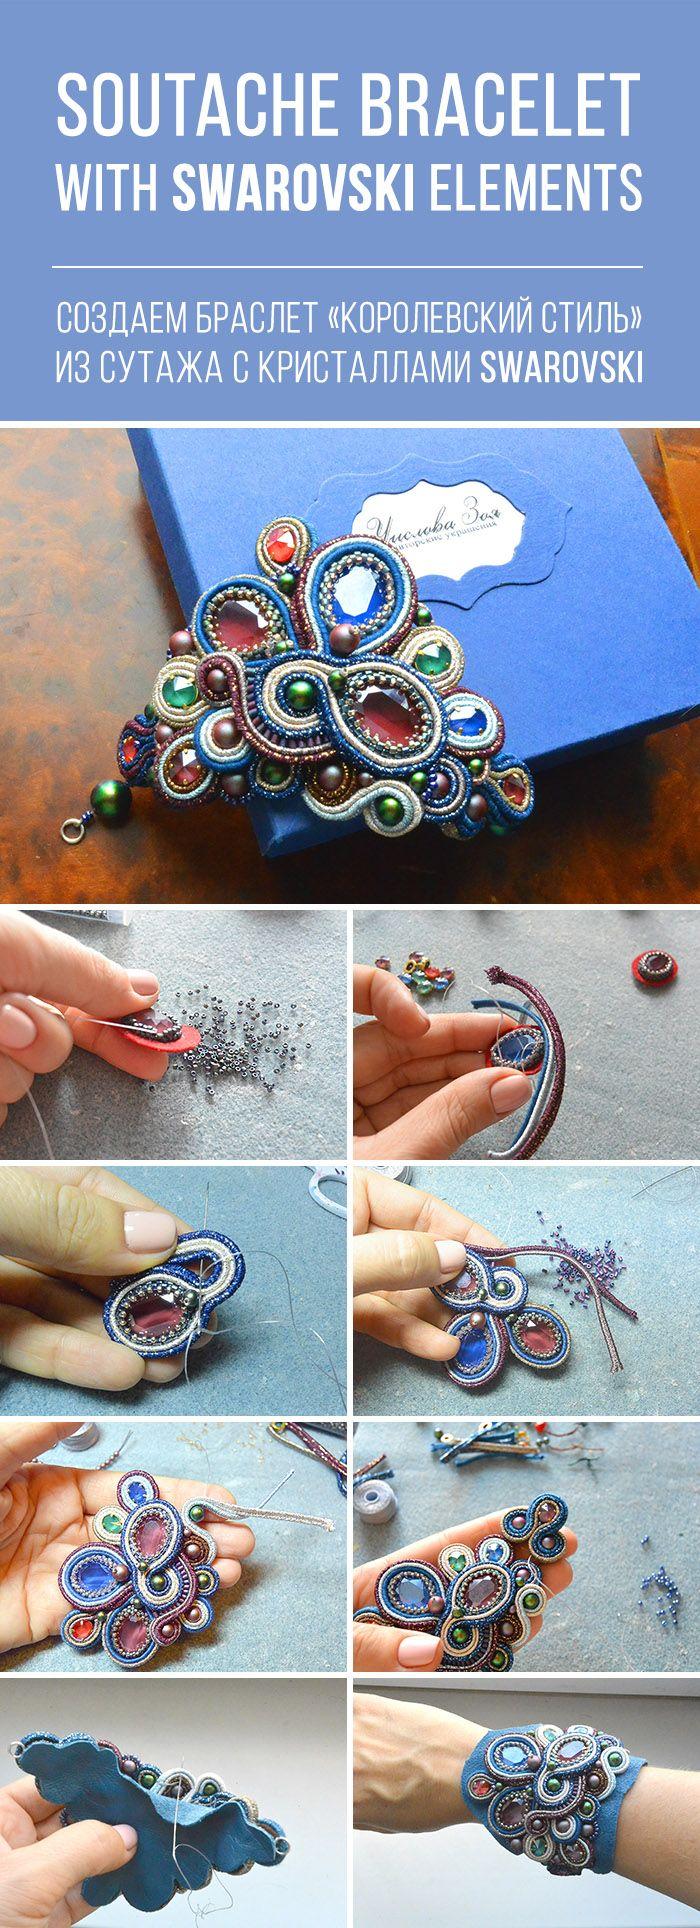 Soutache bracelet with Swarovski elements tutorial | Создаем браслет «Королевский стиль» из сутажа с кристаллами Swarovski